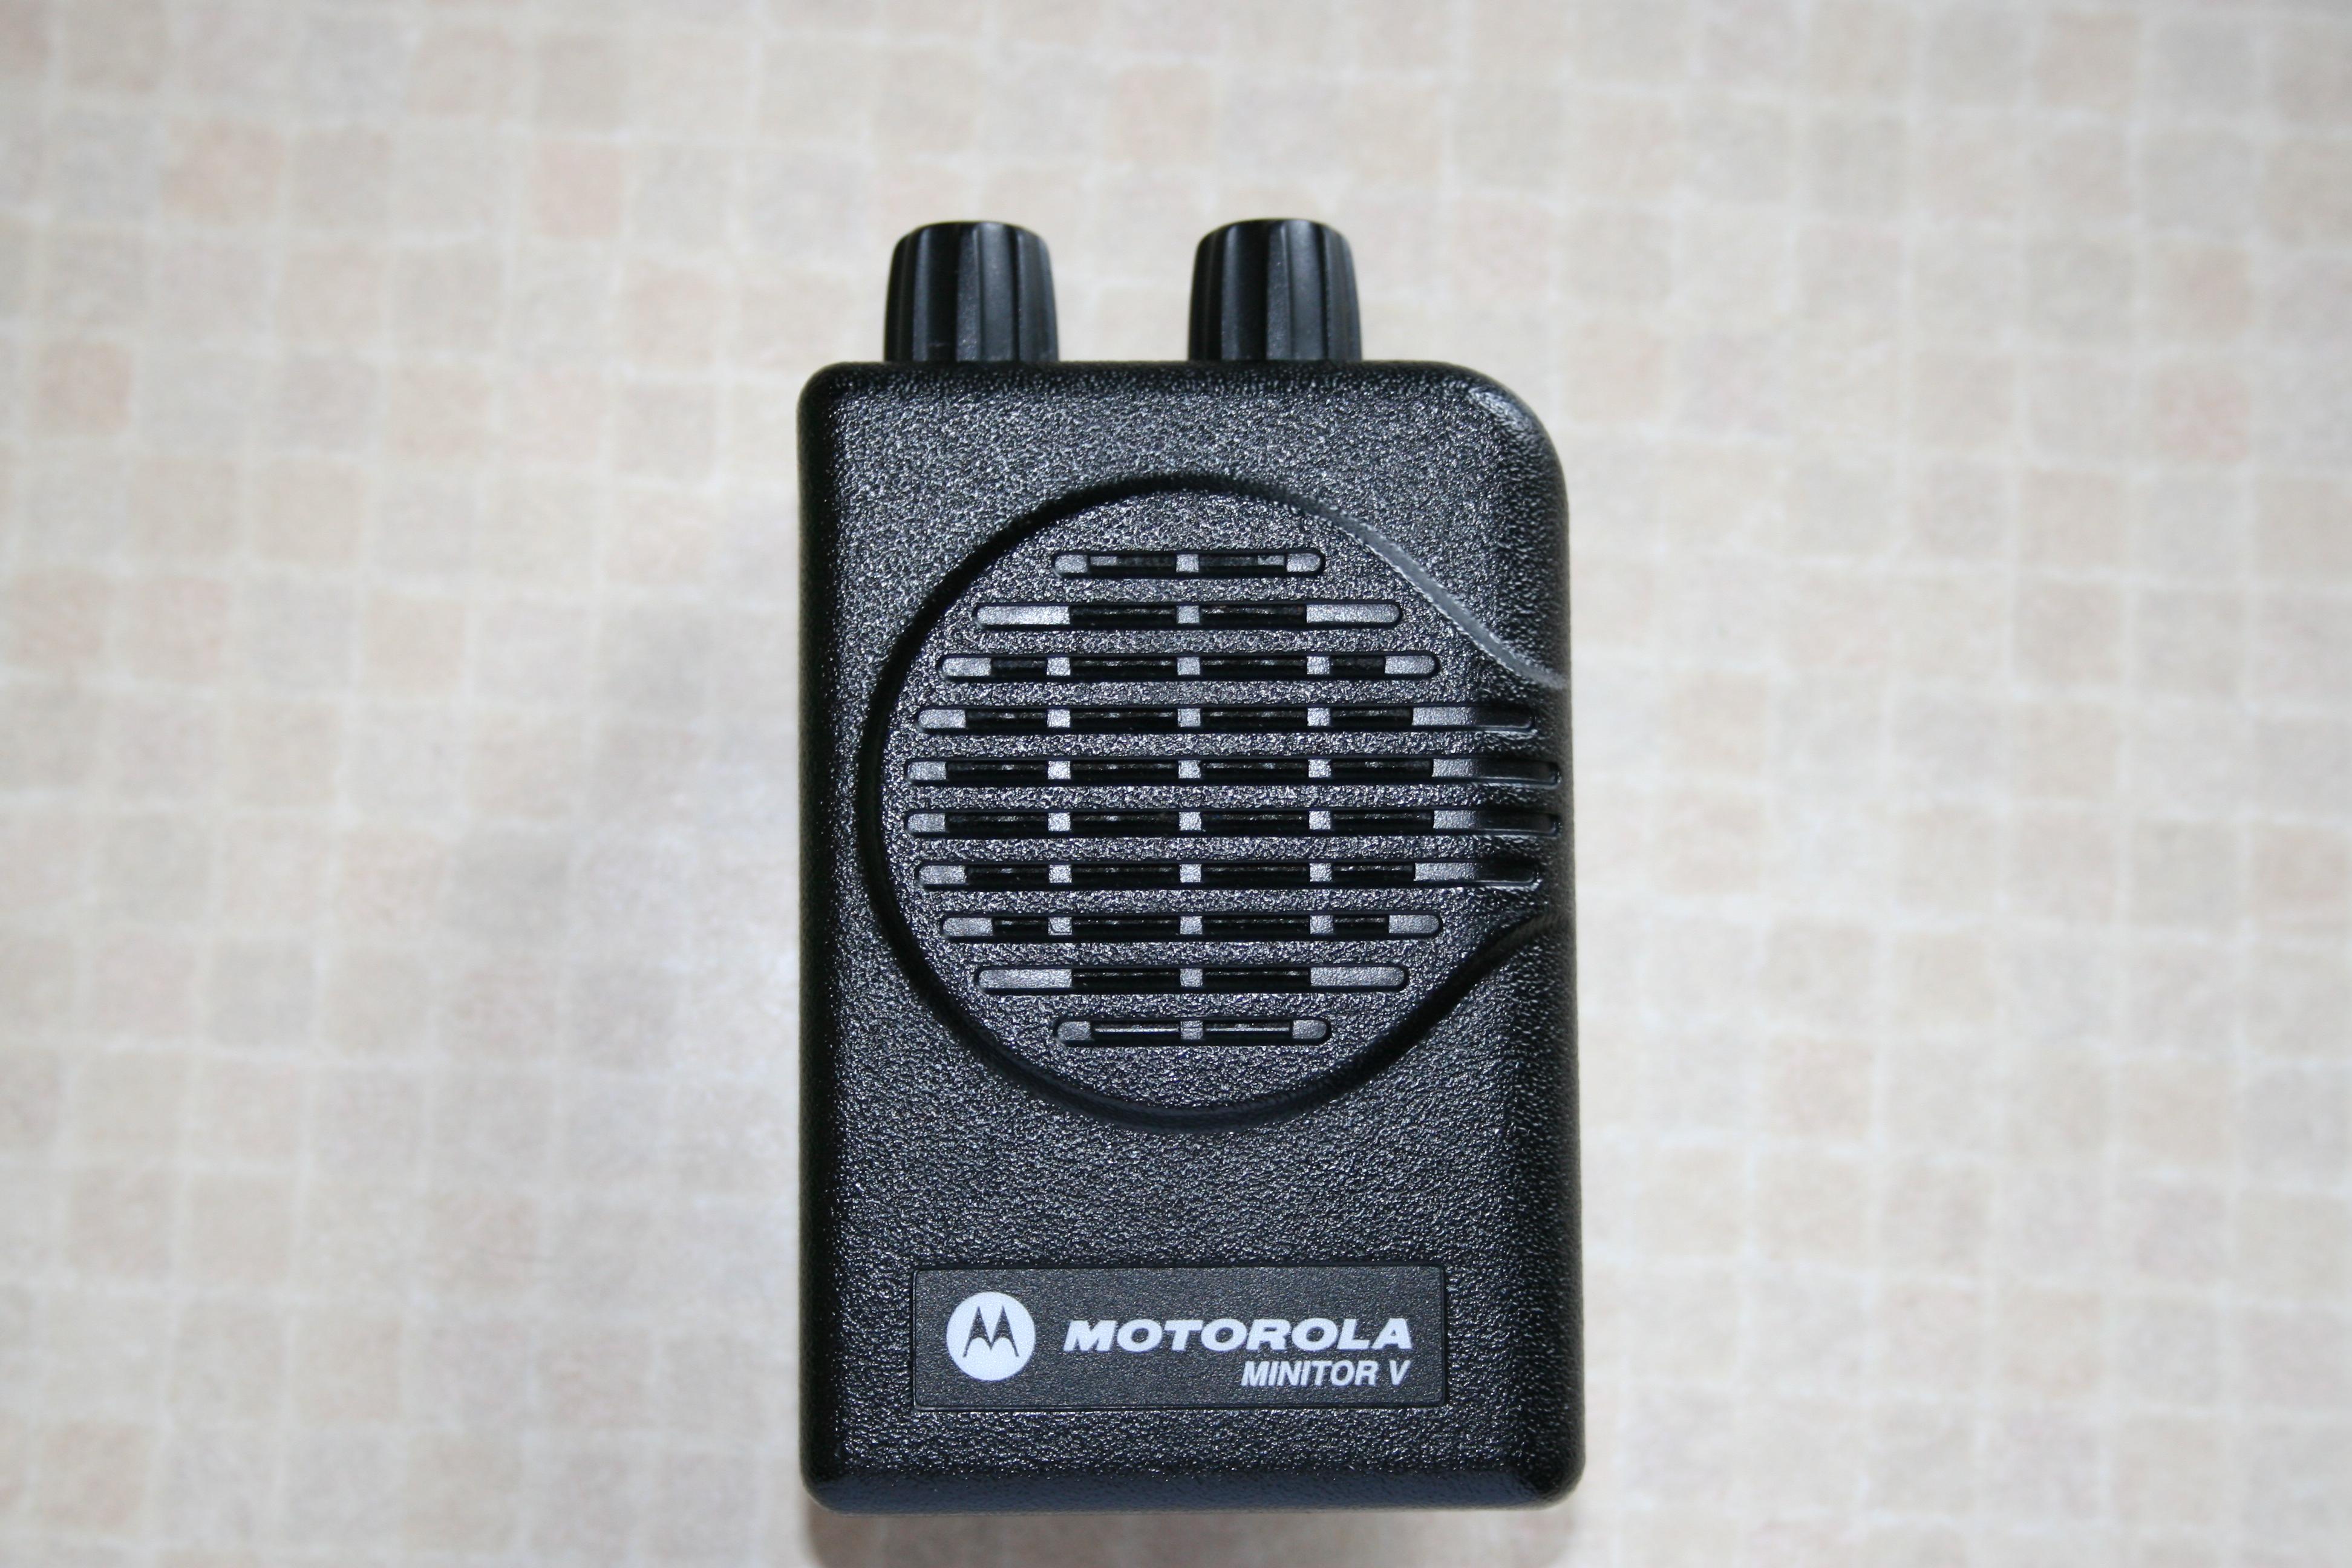 Motorola Minitor - Wikipedia